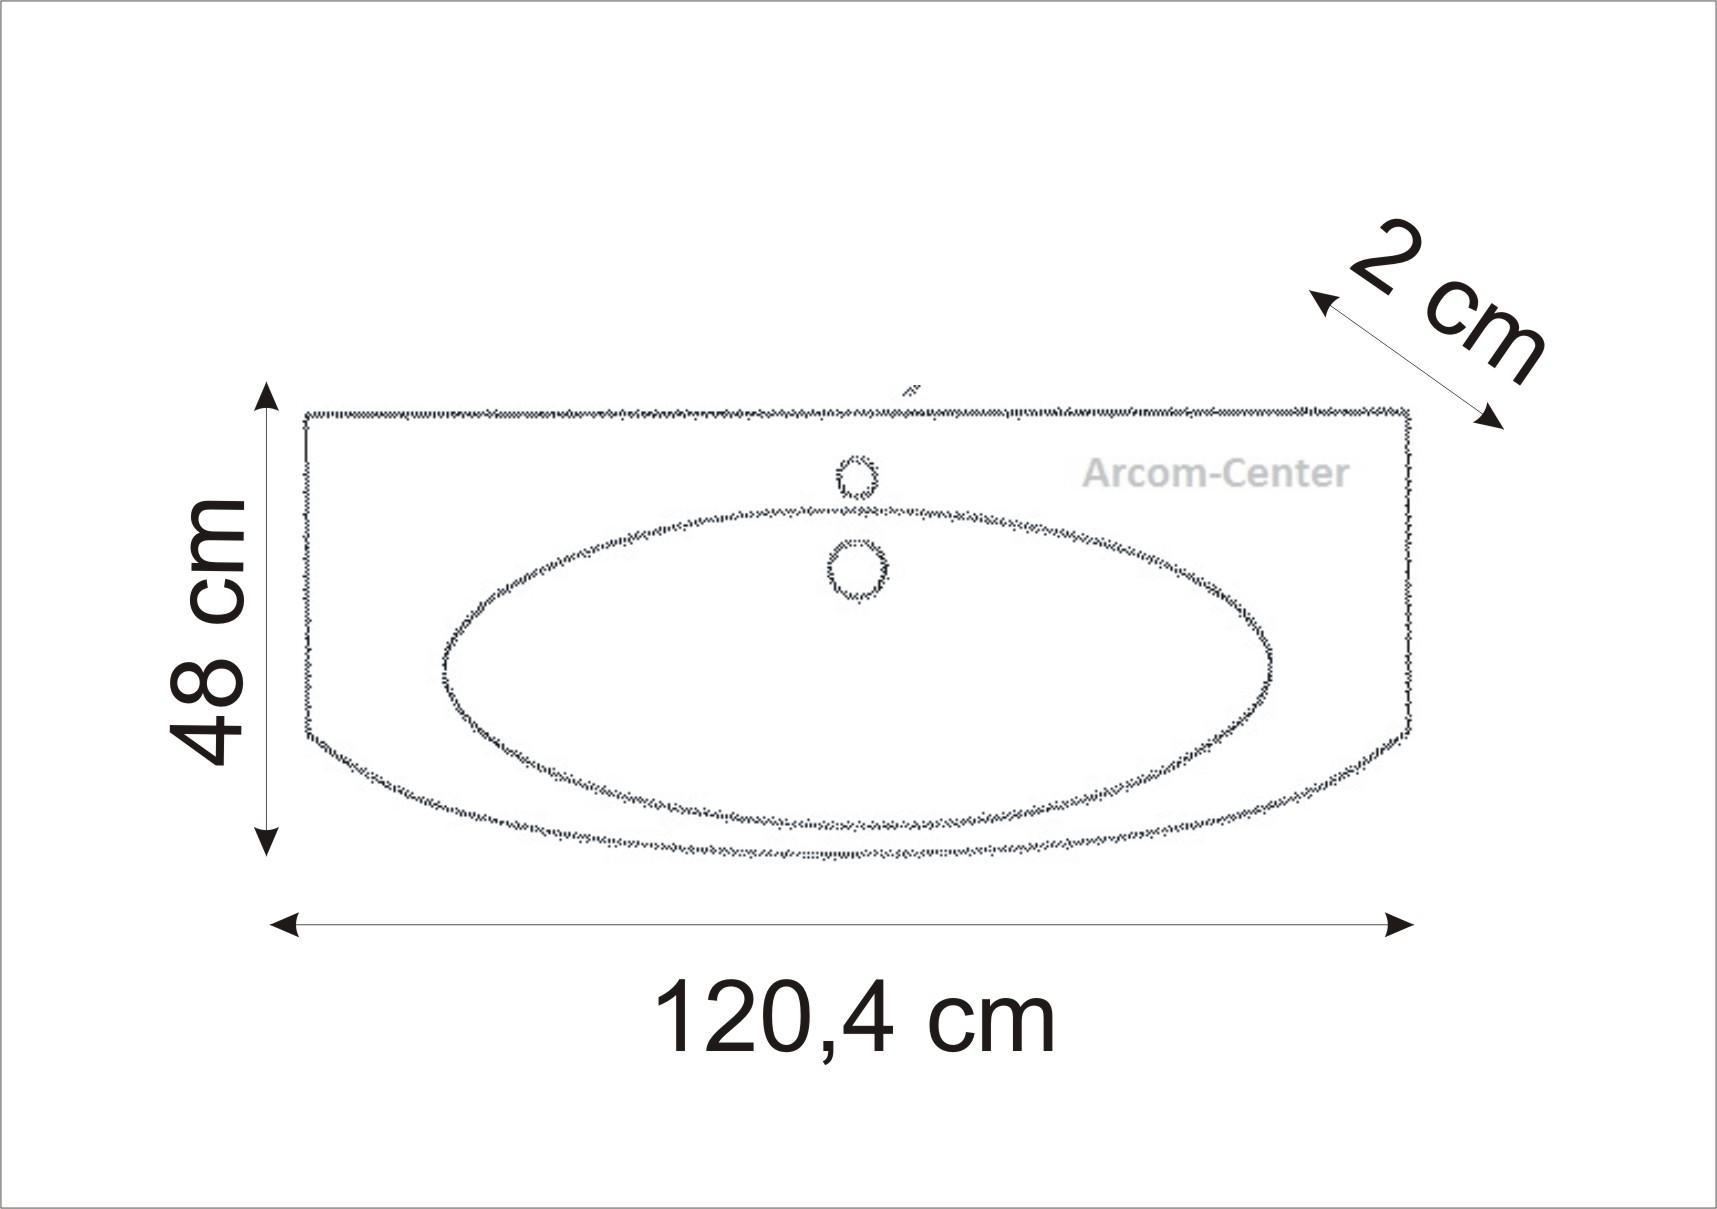 marlin bad 3100 scala waschtisch 120 cm arcom center. Black Bedroom Furniture Sets. Home Design Ideas